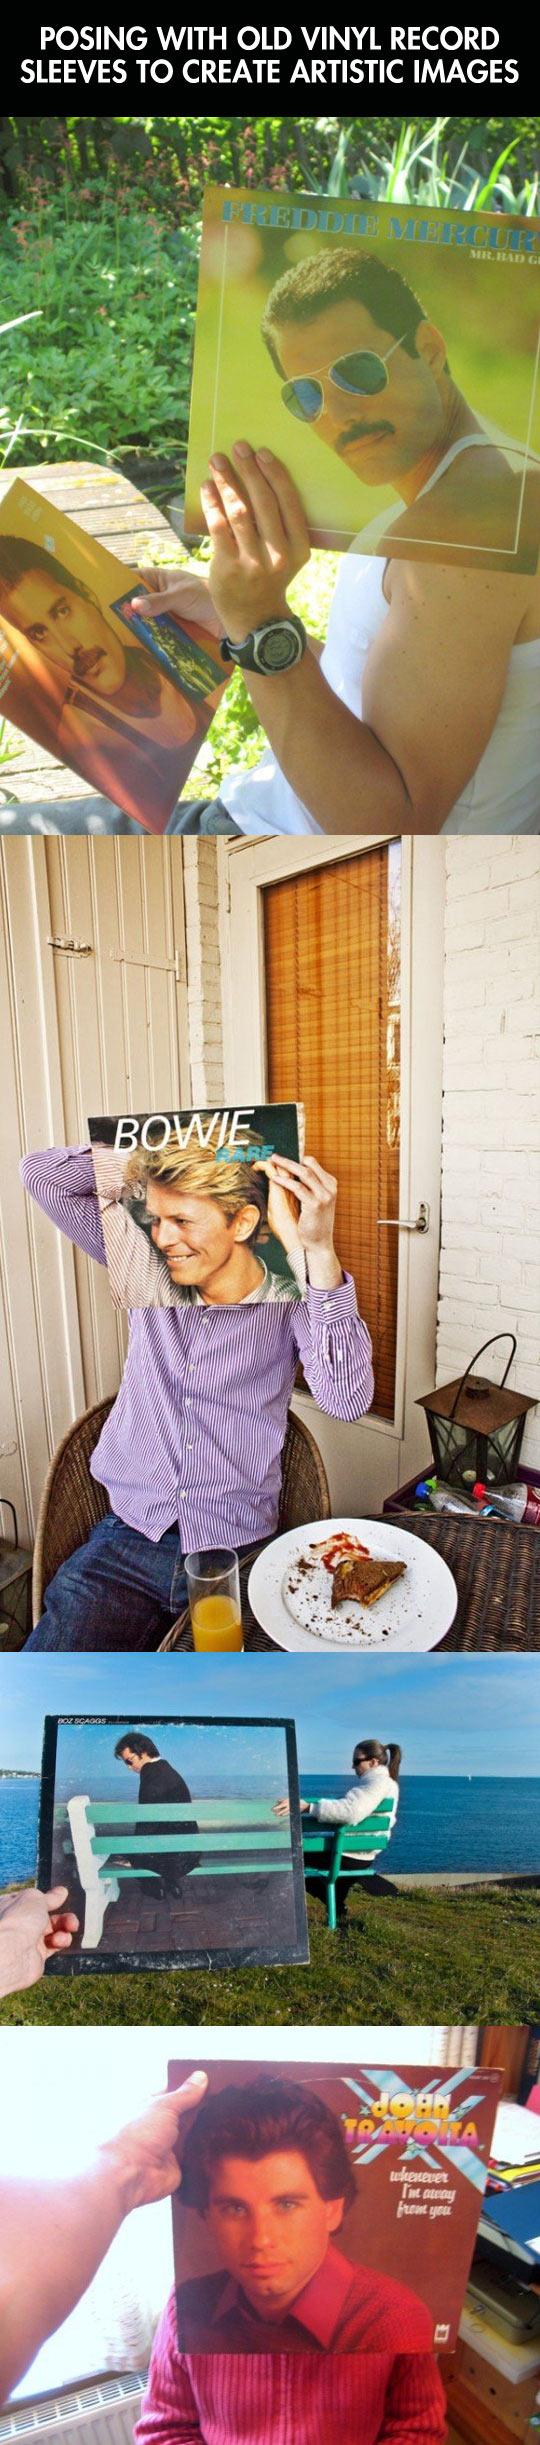 funny-posing-old-vinyl-record